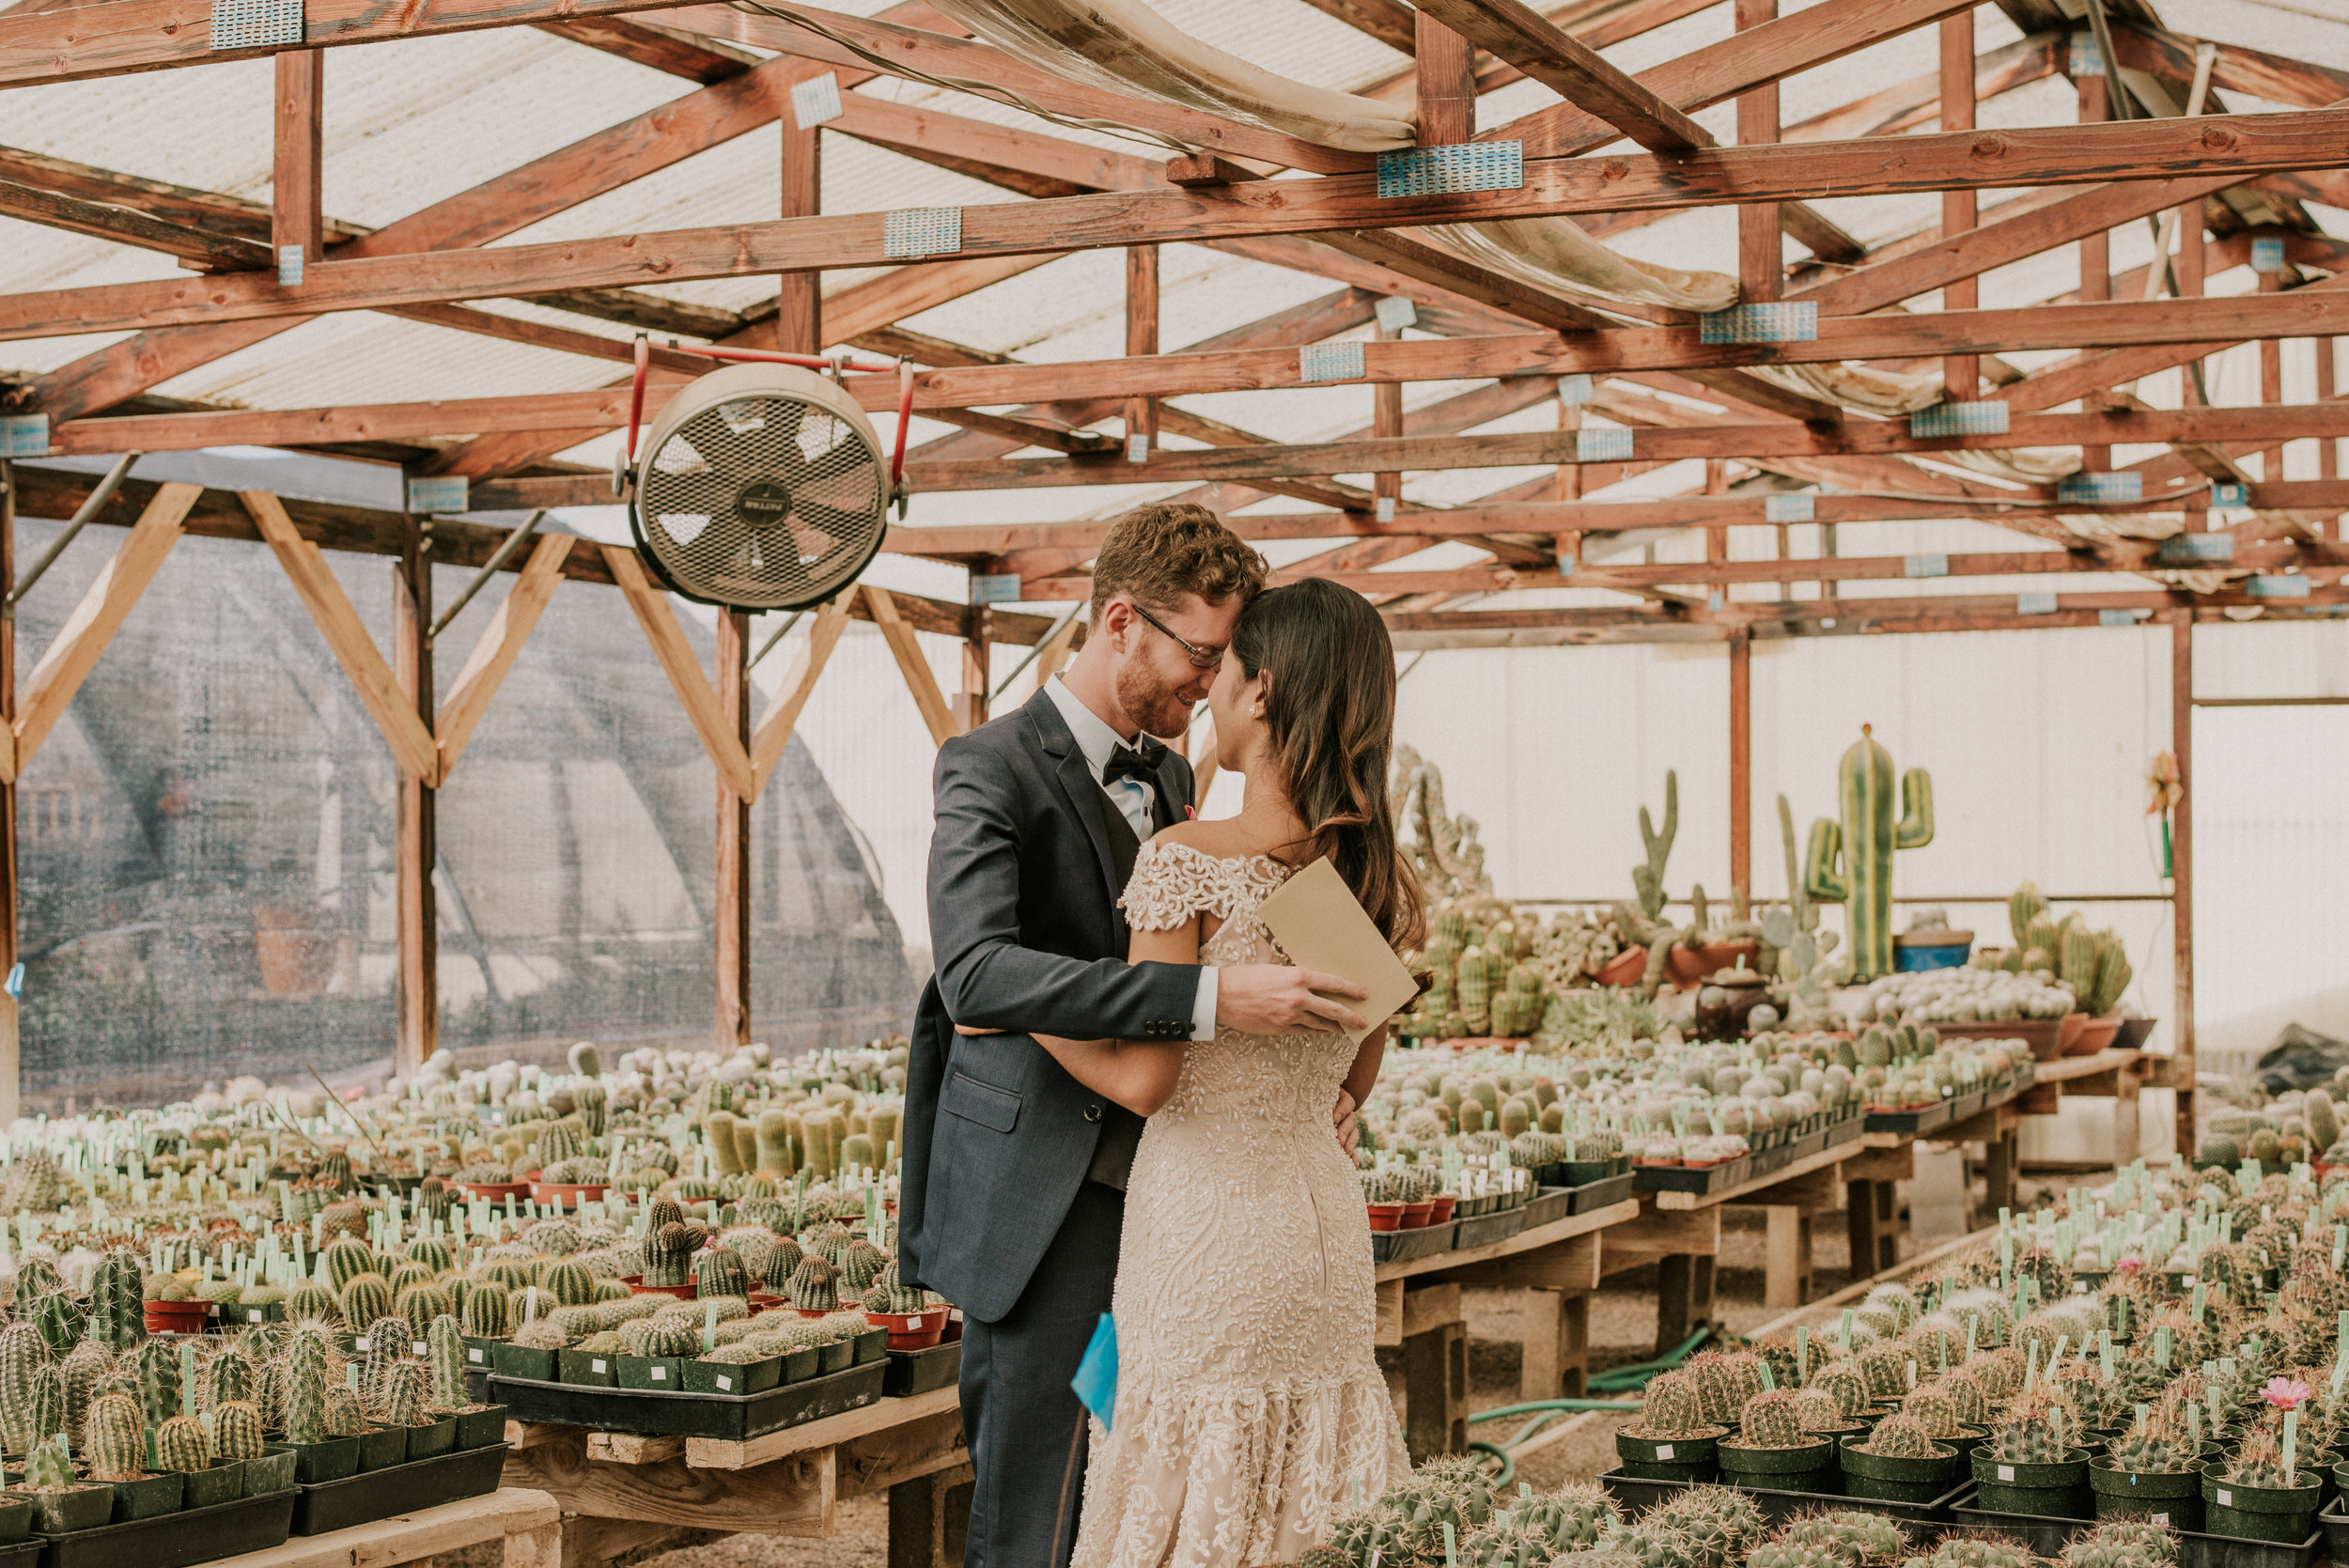 Tucson Intimate DIY Backyard Wedding_-5.jpg